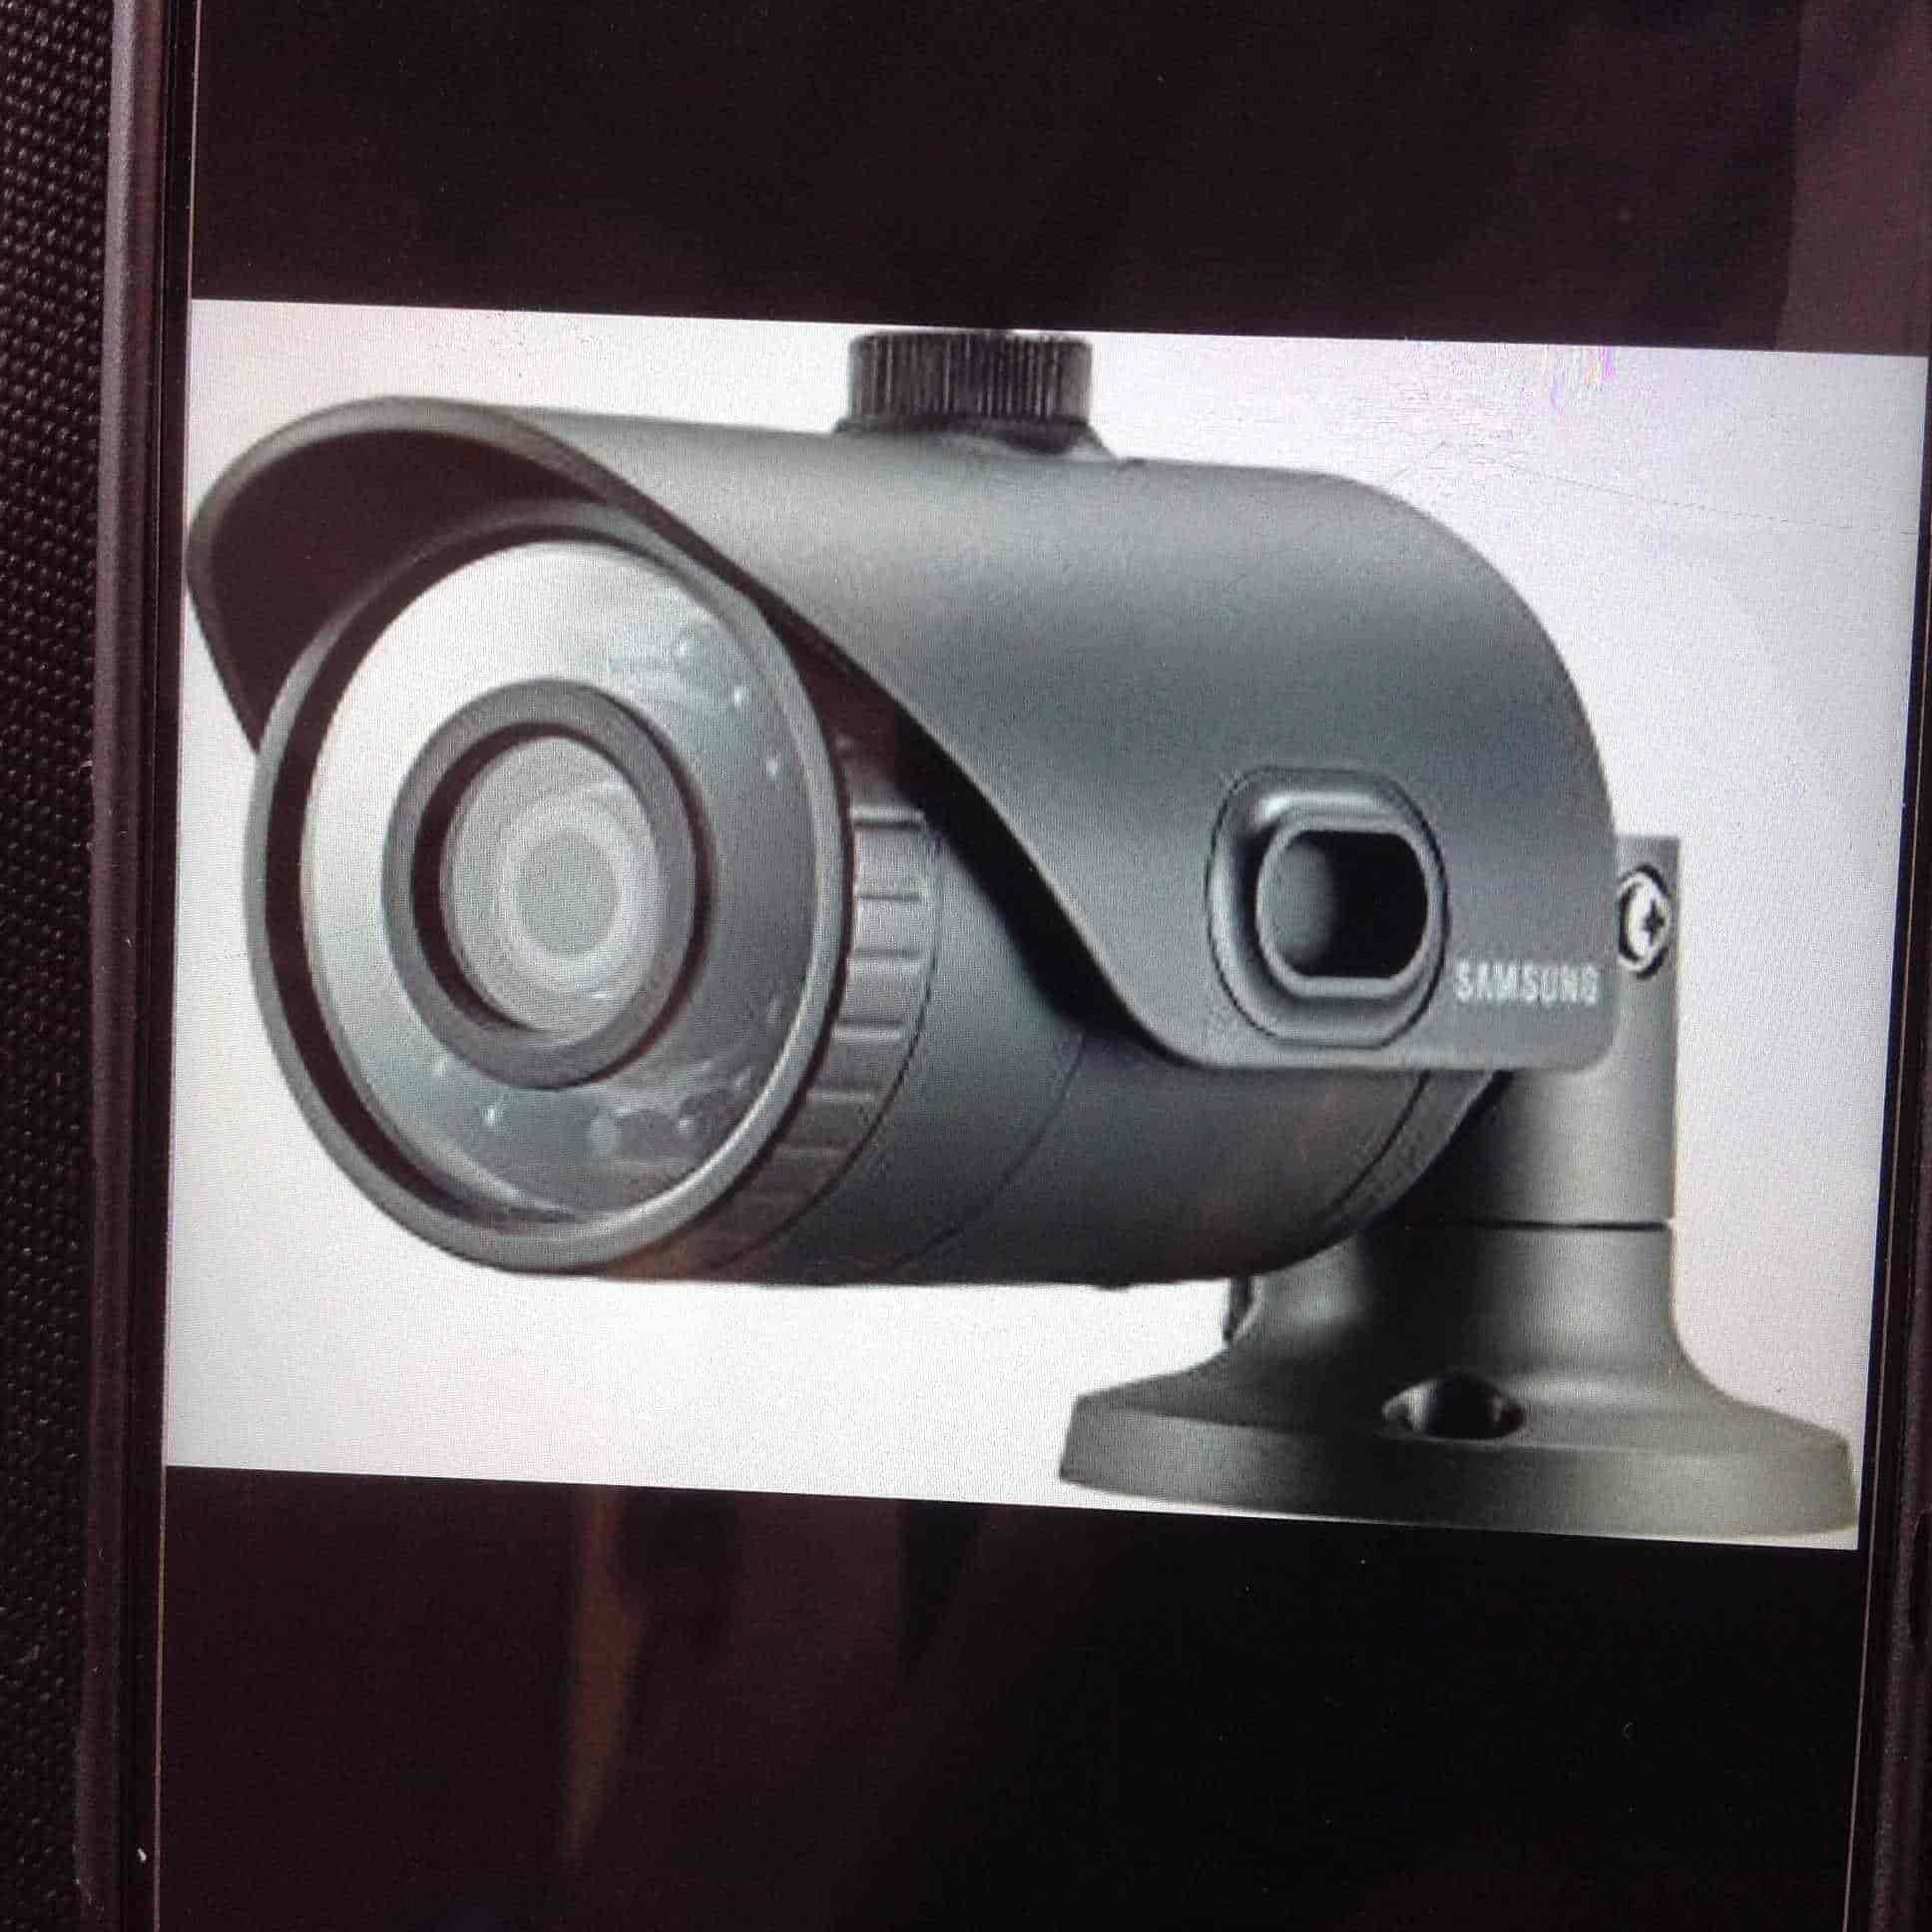 Eye 4 U Surveillance Solutions (Closed Down), Nagarbhavi